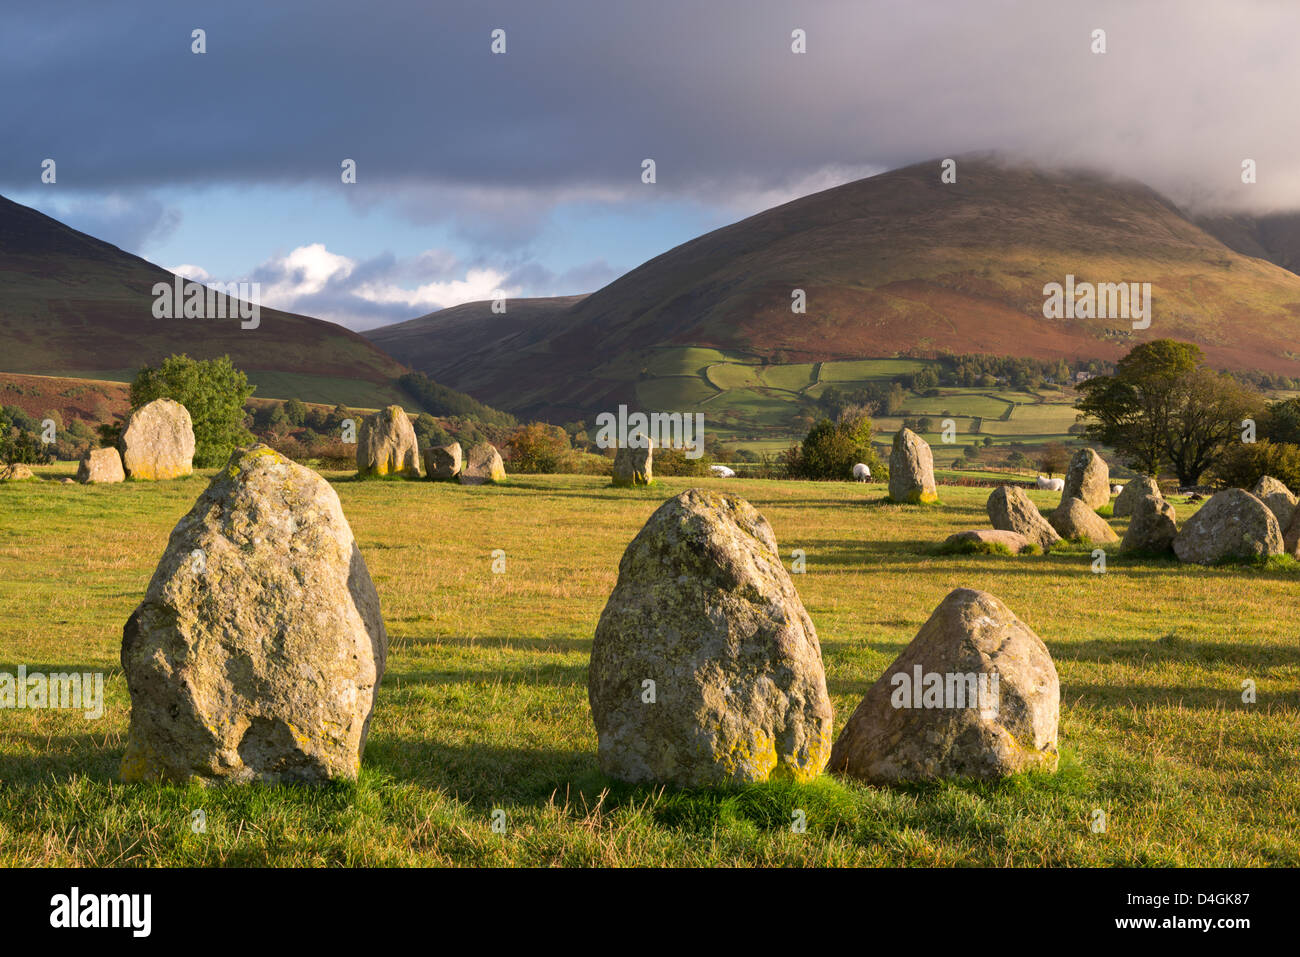 Castlerigg Stone Circle with Blencathra mountain behind, Lake District, Cumbria, England. Autumn (October) 2012. Stock Photo